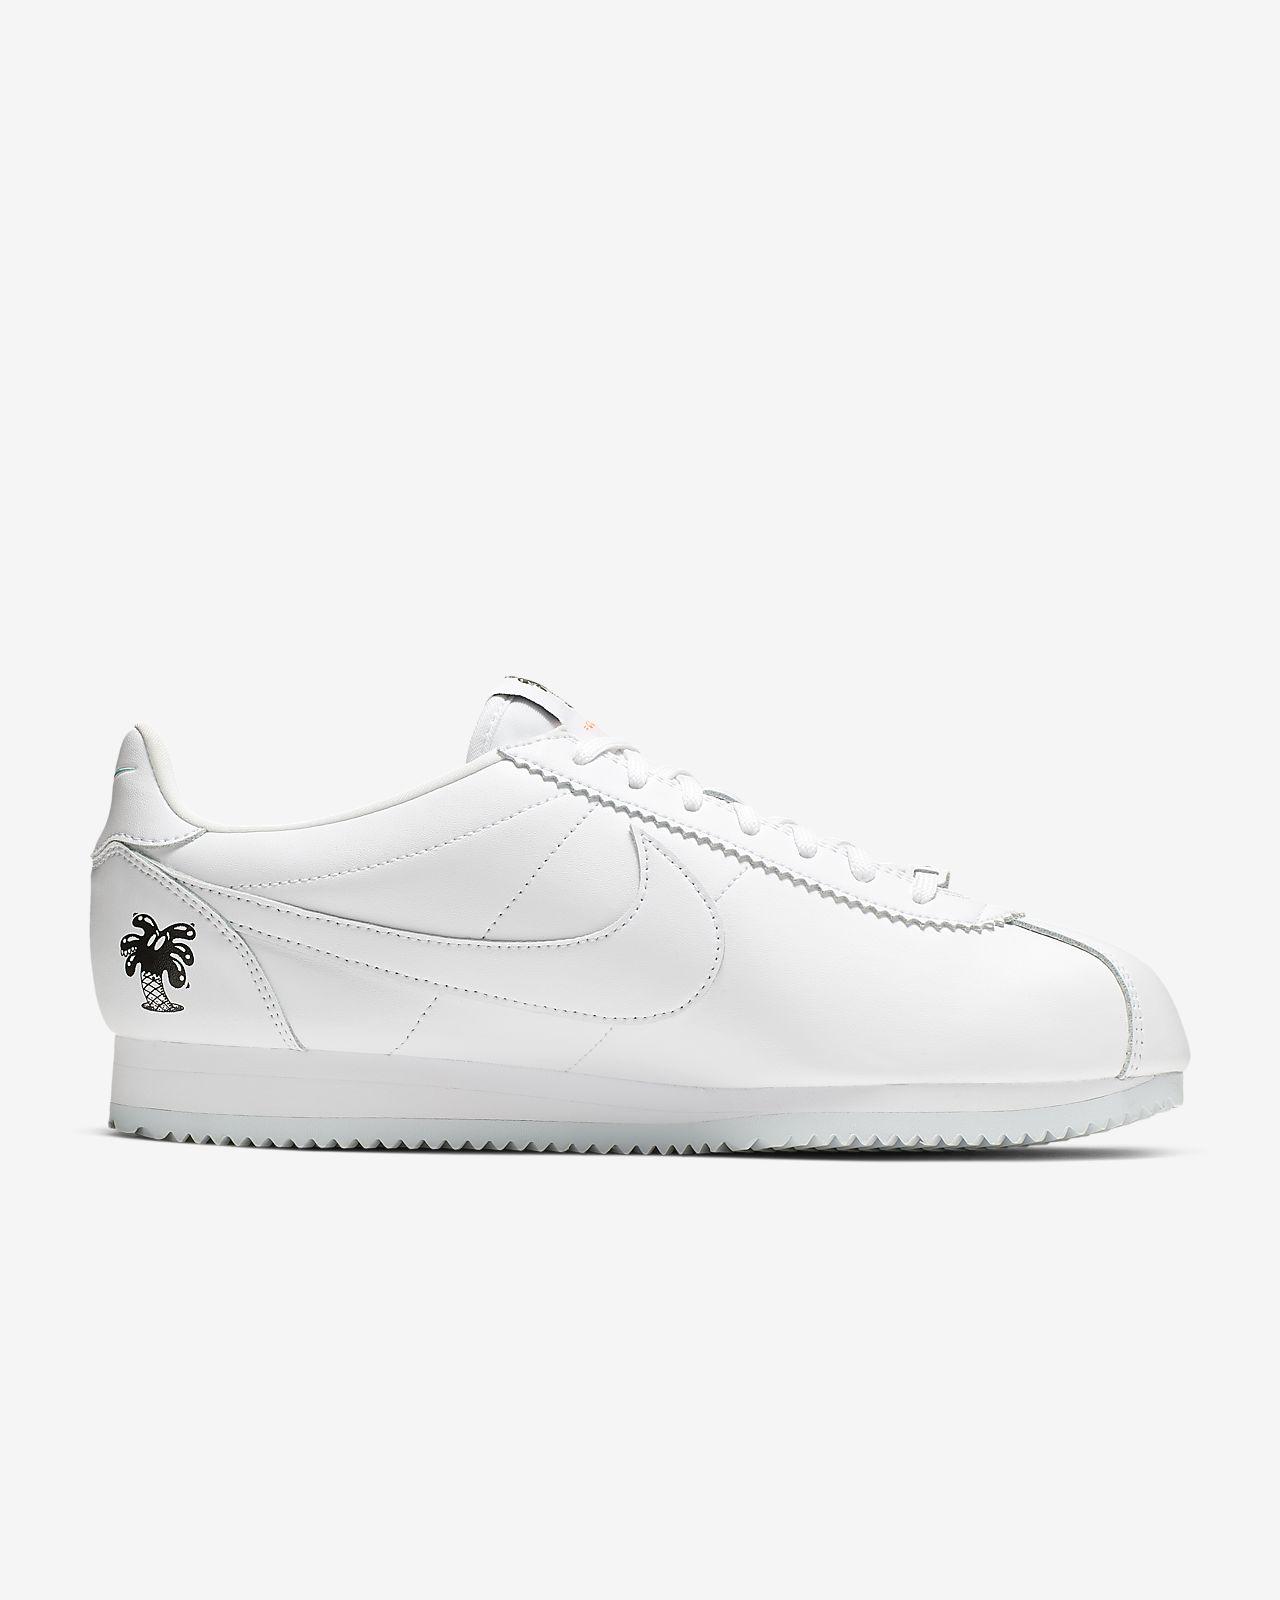 c5d0423c814f ... Nike Cortez QS Flyleather with at least 50% leather fibre Men s Shoe